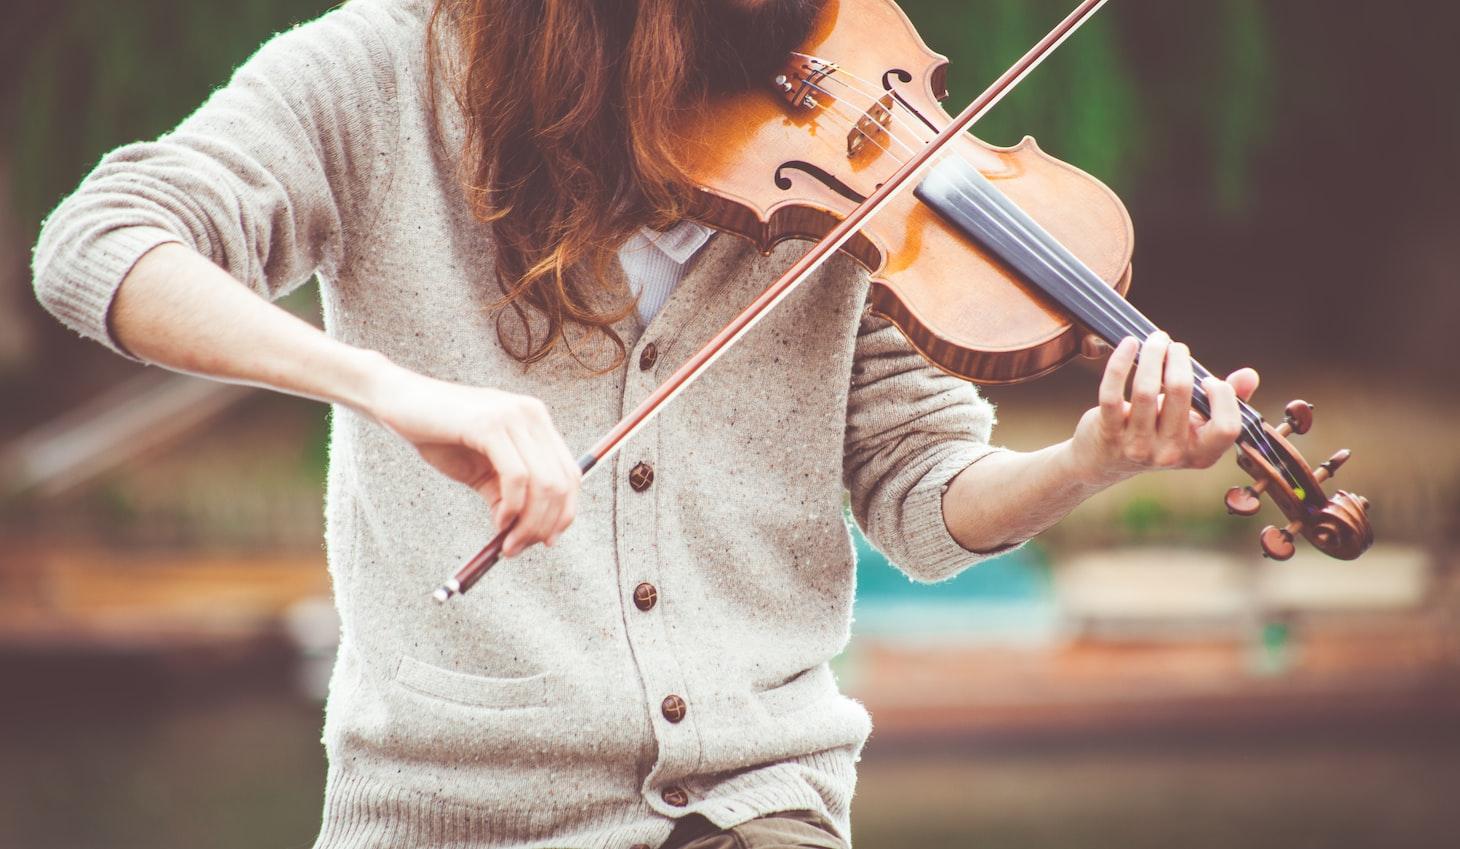 music-stand-musician